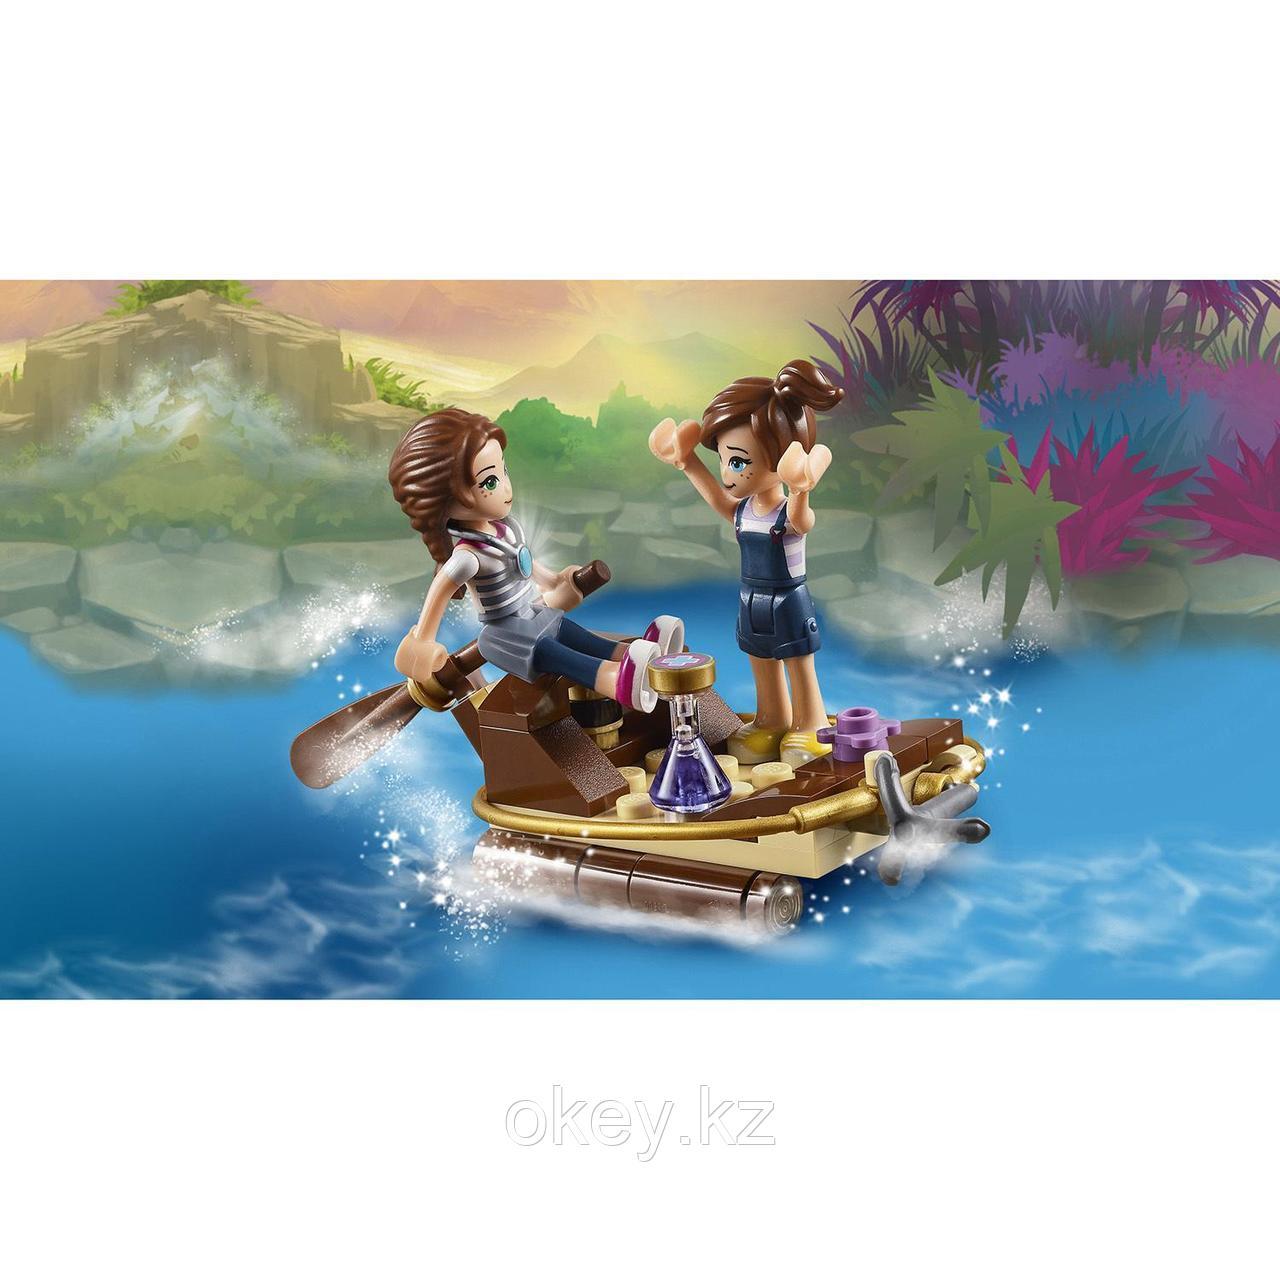 LEGO Elves: Побег из крепости Короля гоблинов 41188 - фото 8